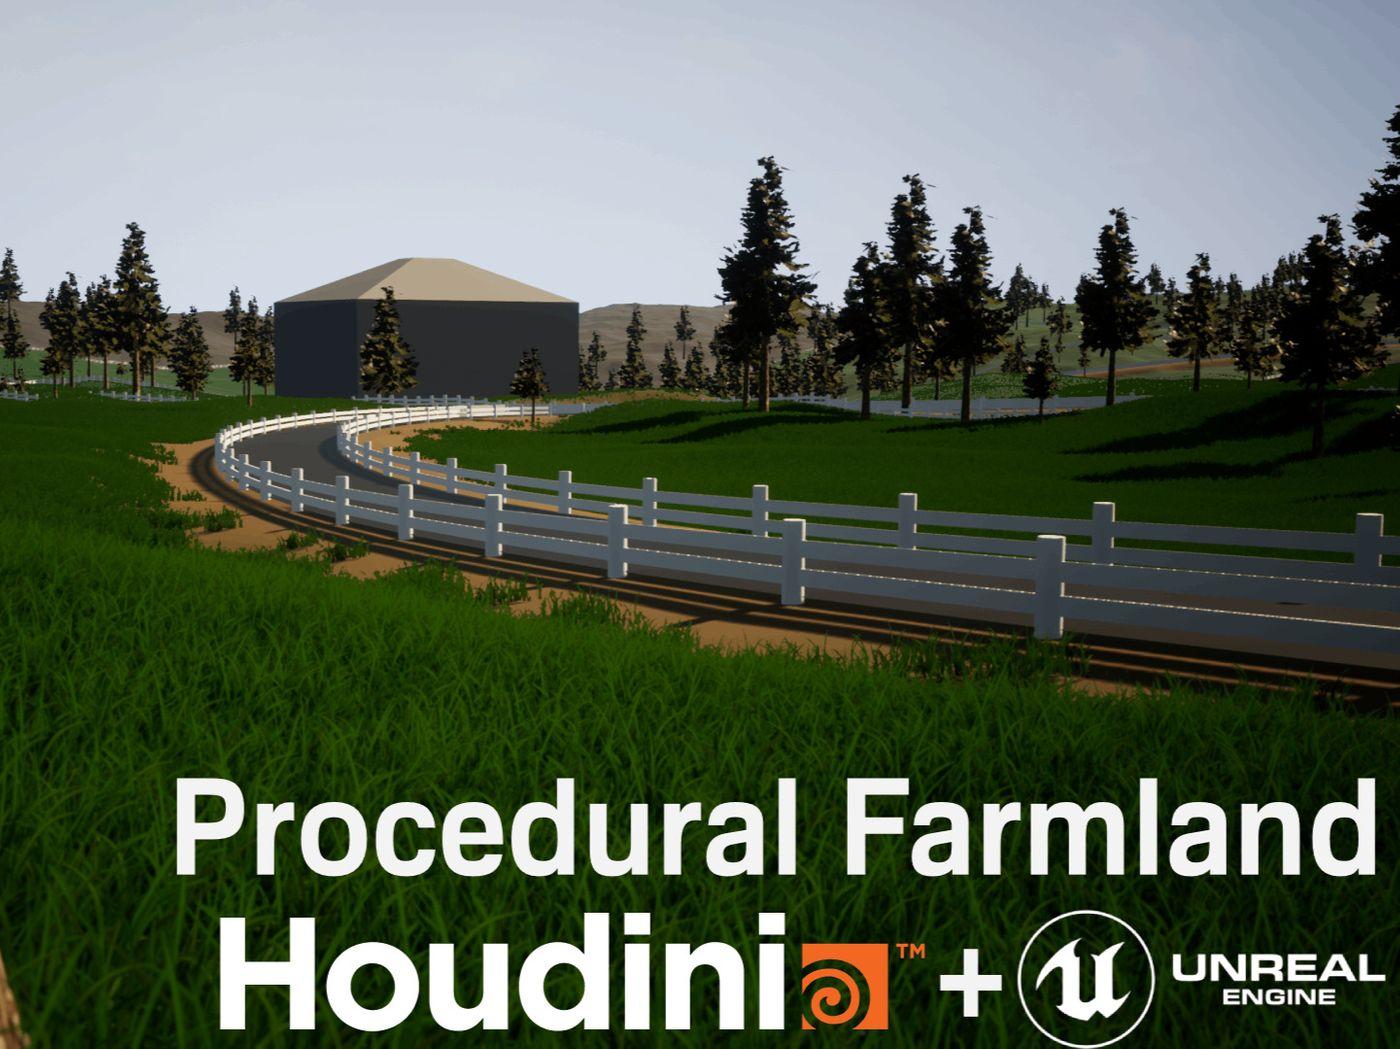 Houdini + UE4 Procedural Farmland Generation